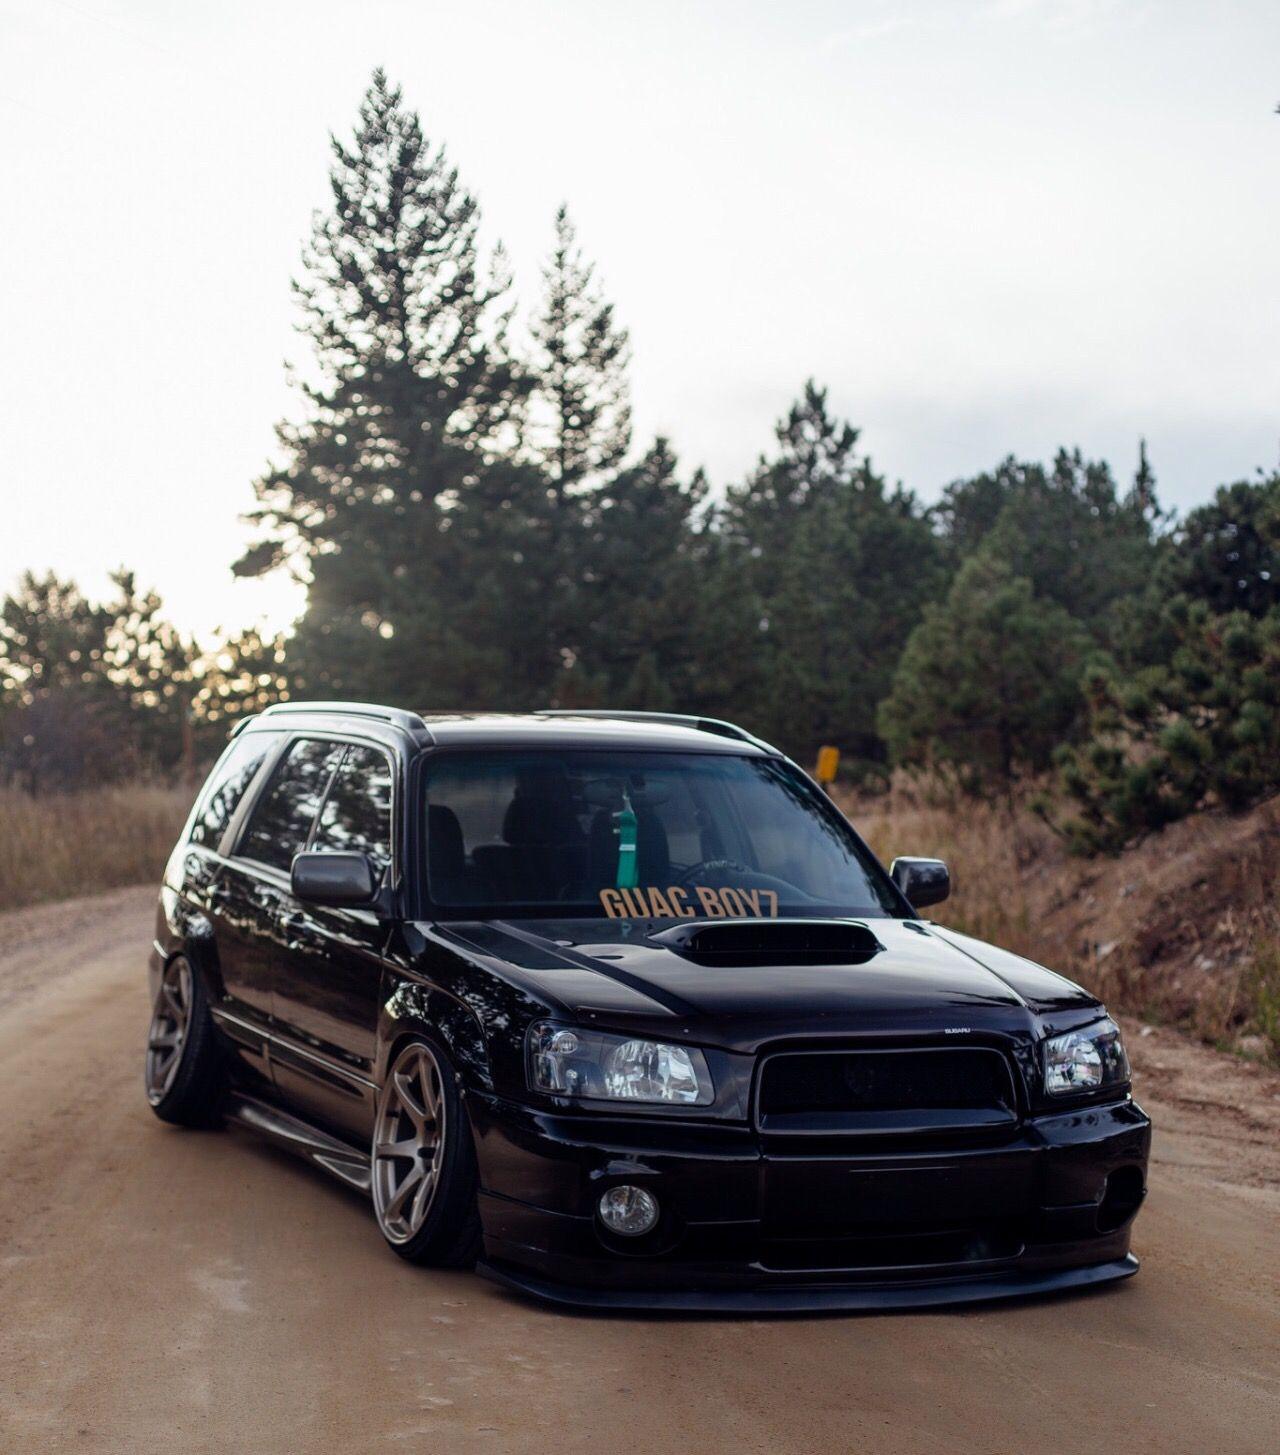 Subaru Forester Https Www Instagram Com Jdmundergroundofficial